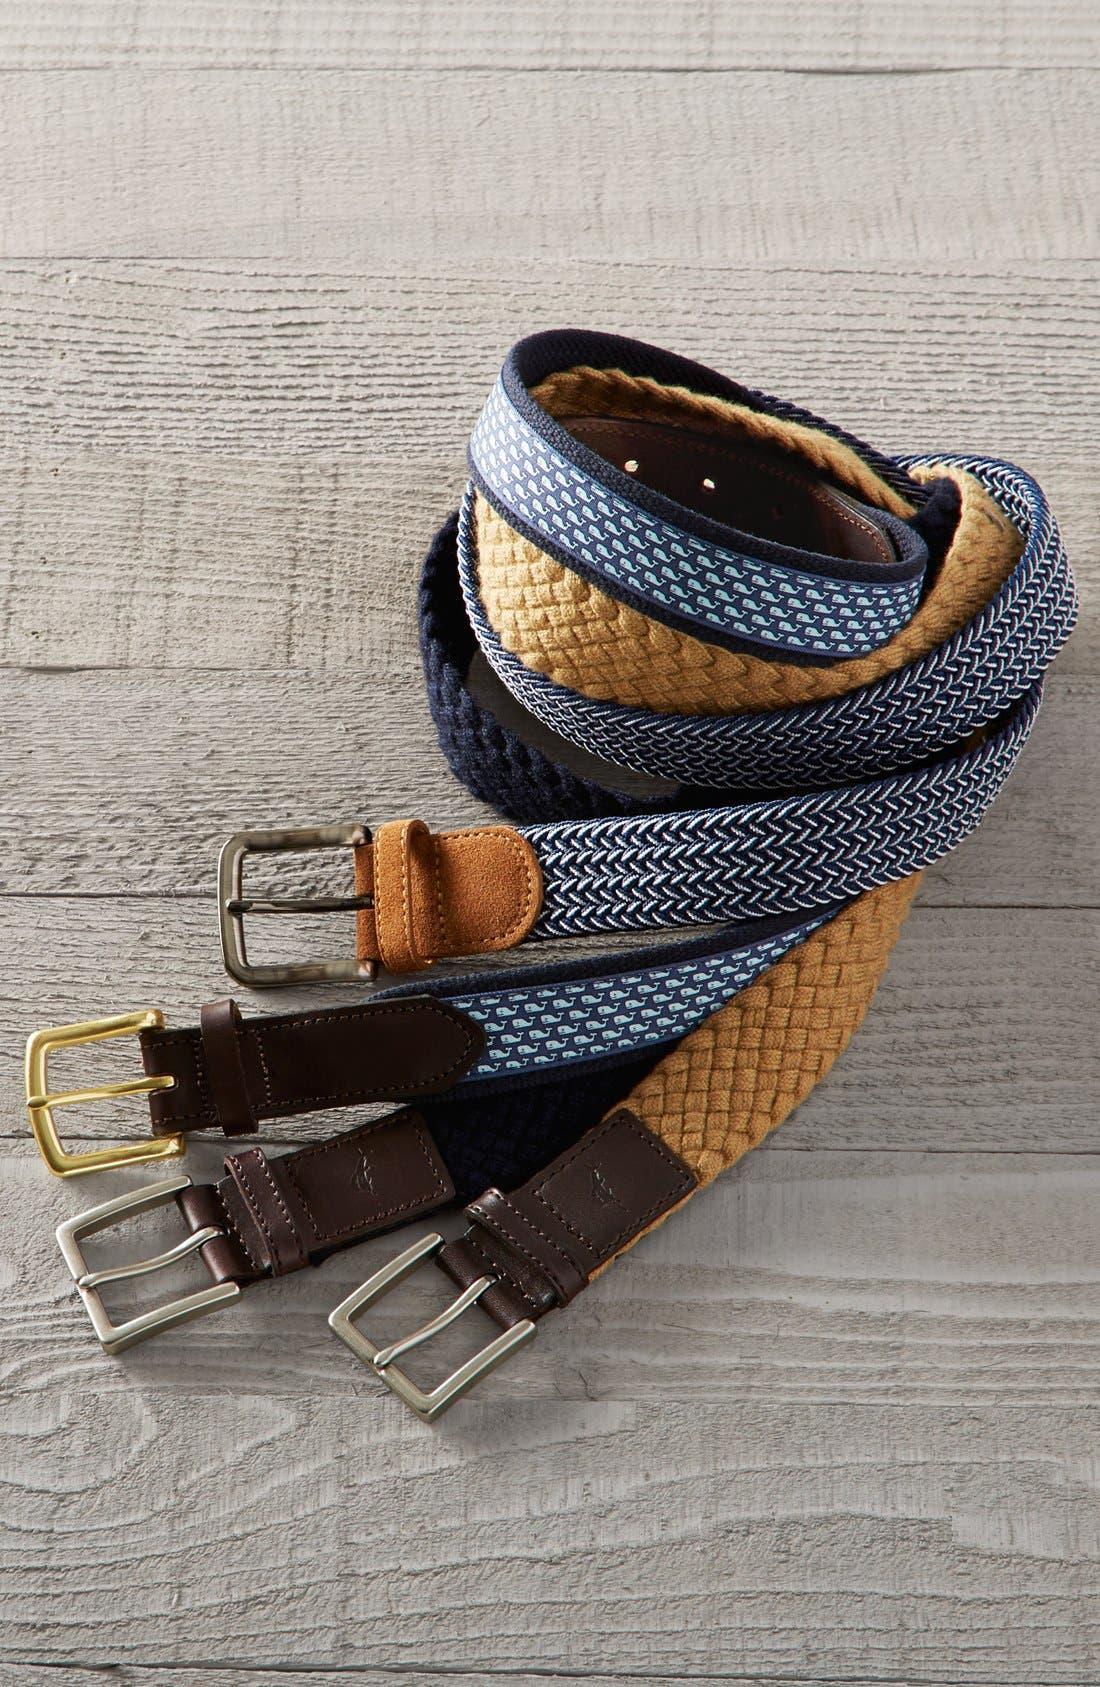 Whale Club Leather & Canvas Belt,                             Alternate thumbnail 3, color,                             NAVY